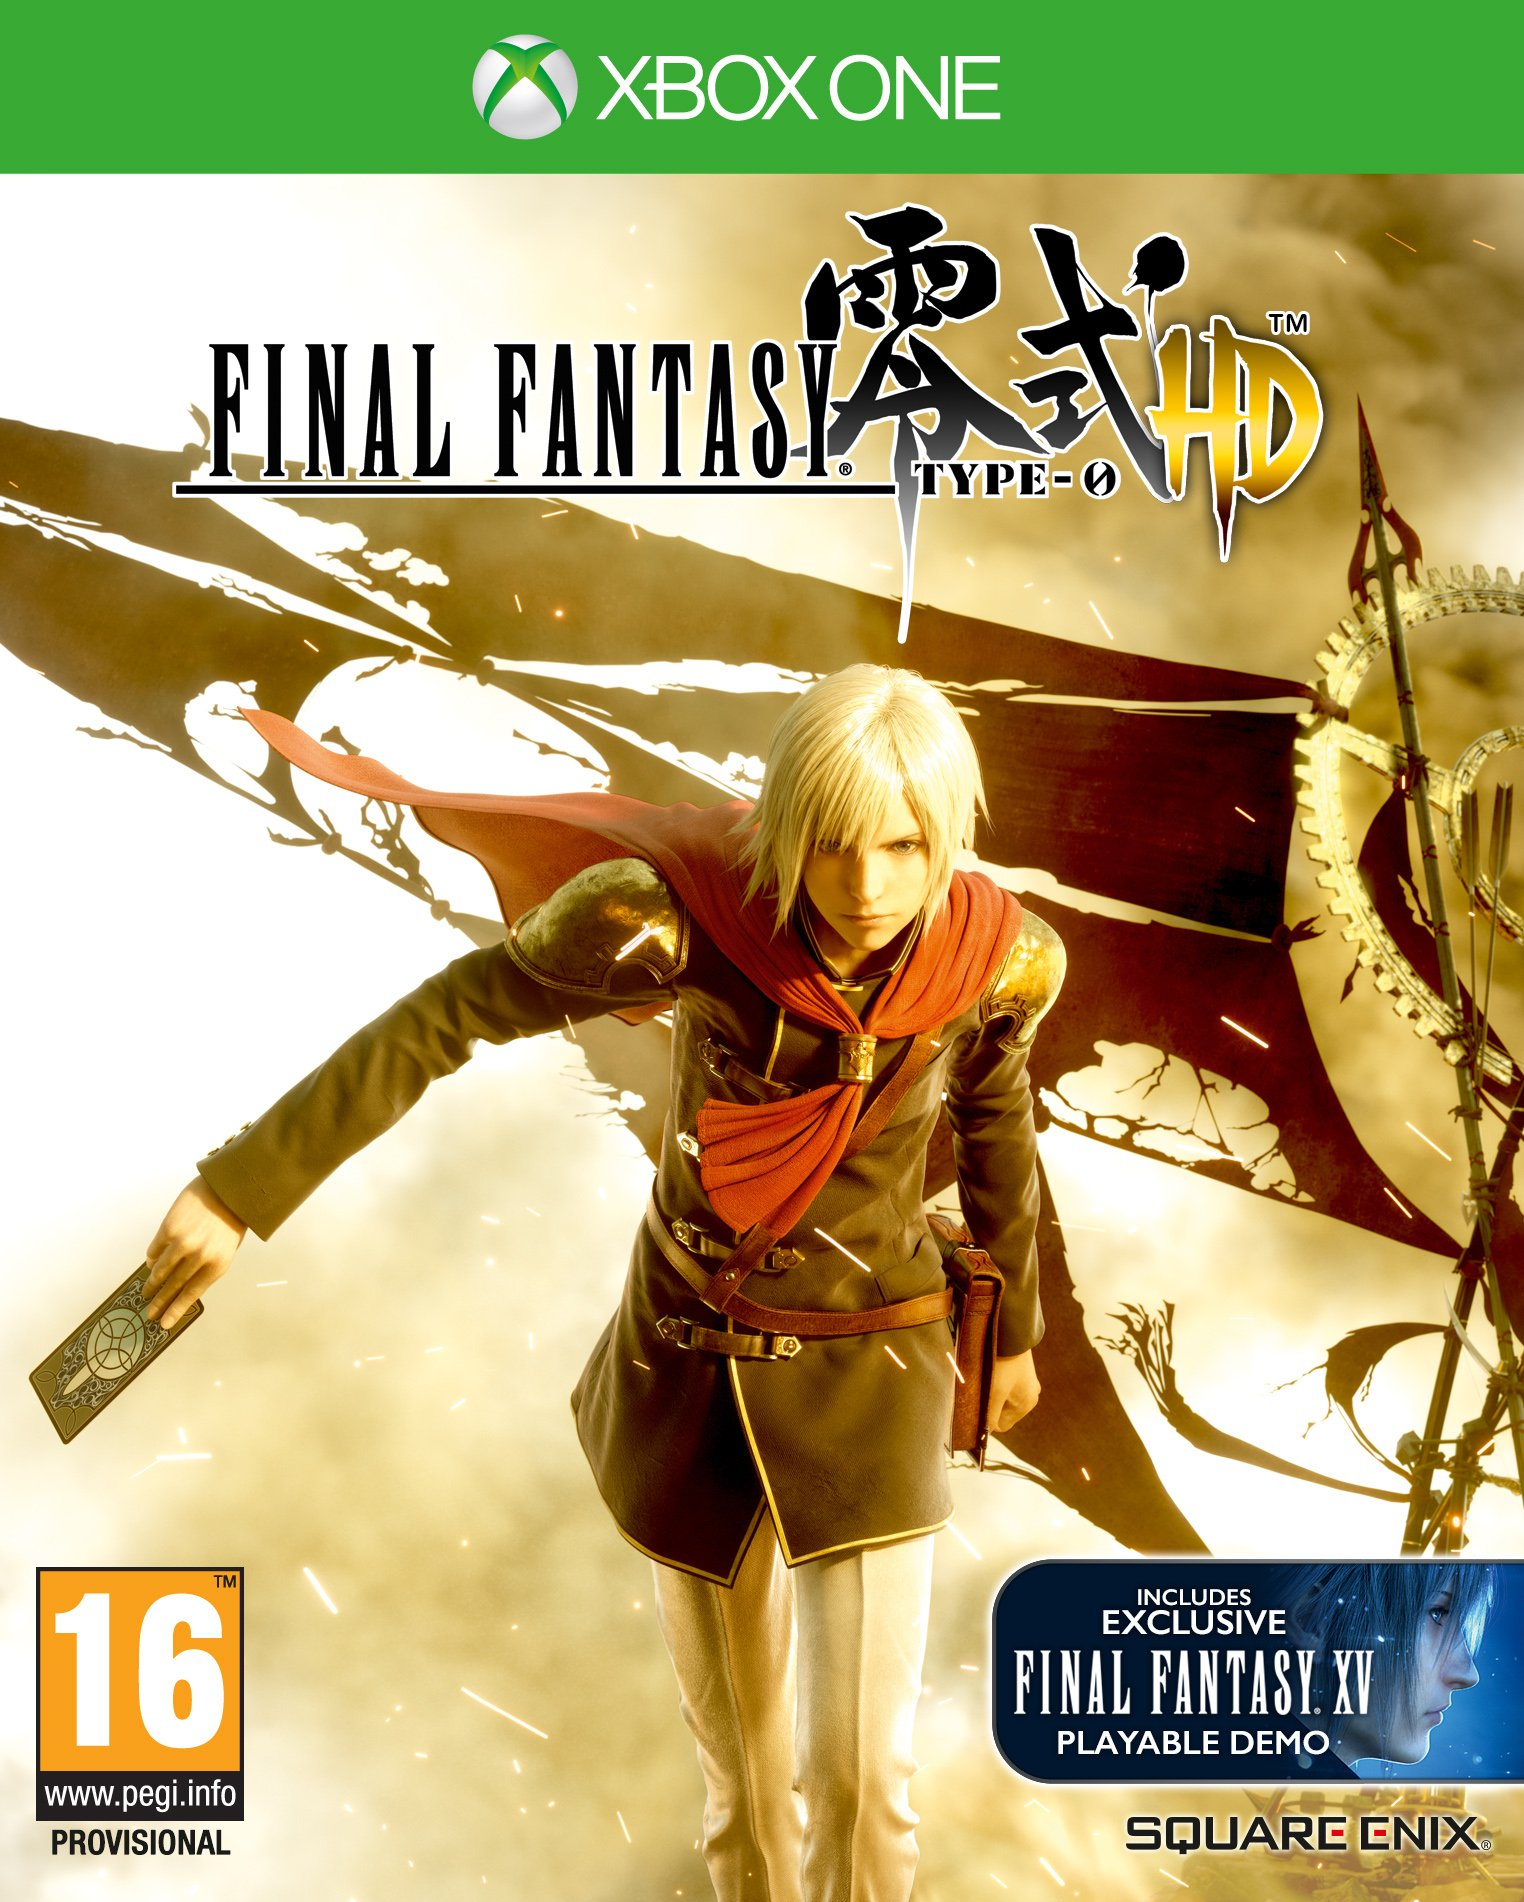 Final Fantasy Type - 0 HD (Inc. Final Fantasy XV Playable Demo)